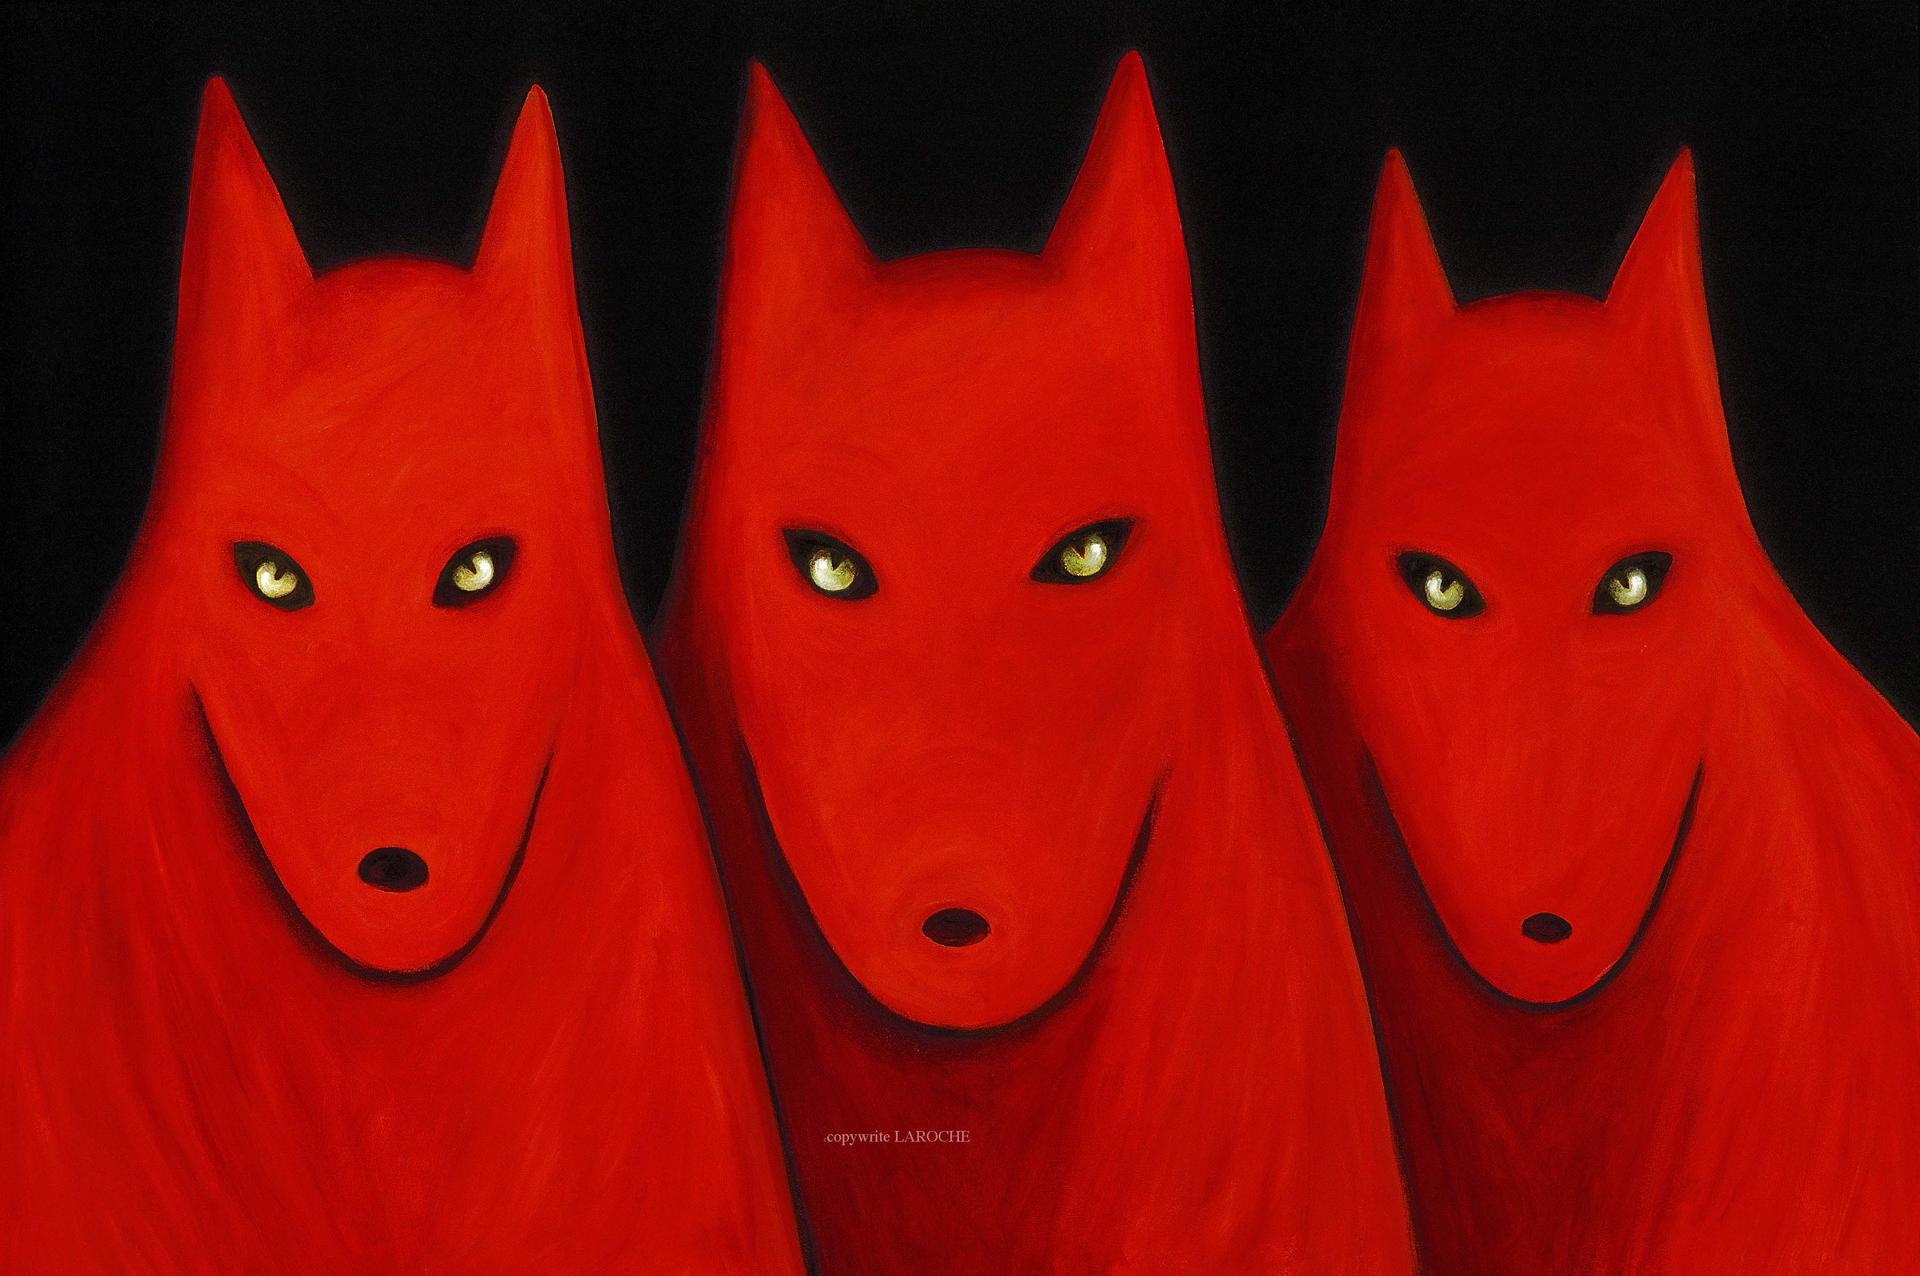 TRES LOBOS by Carole LaRoche